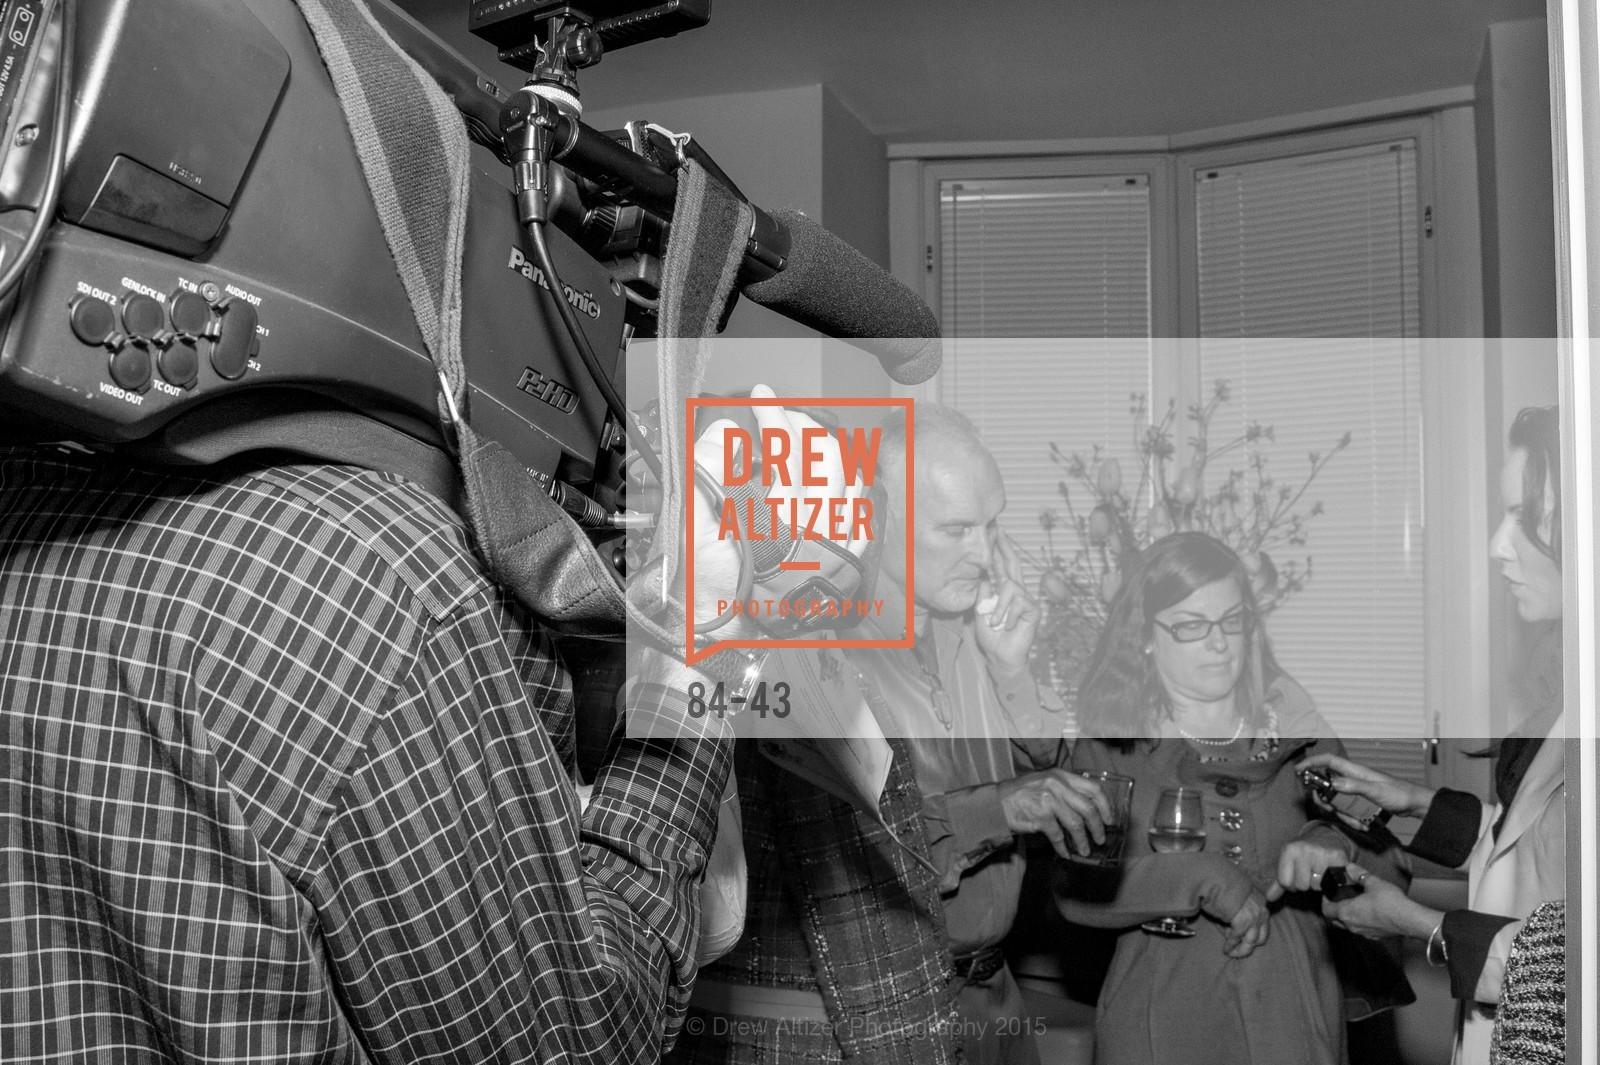 Atmosphere, EPI CENTER MedSpa Anniversary and Launch of REPLETE, Epi Center MedSpa, April 21st, 2015,Drew Altizer, Drew Altizer Photography, full-service event agency, private events, San Francisco photographer, photographer California